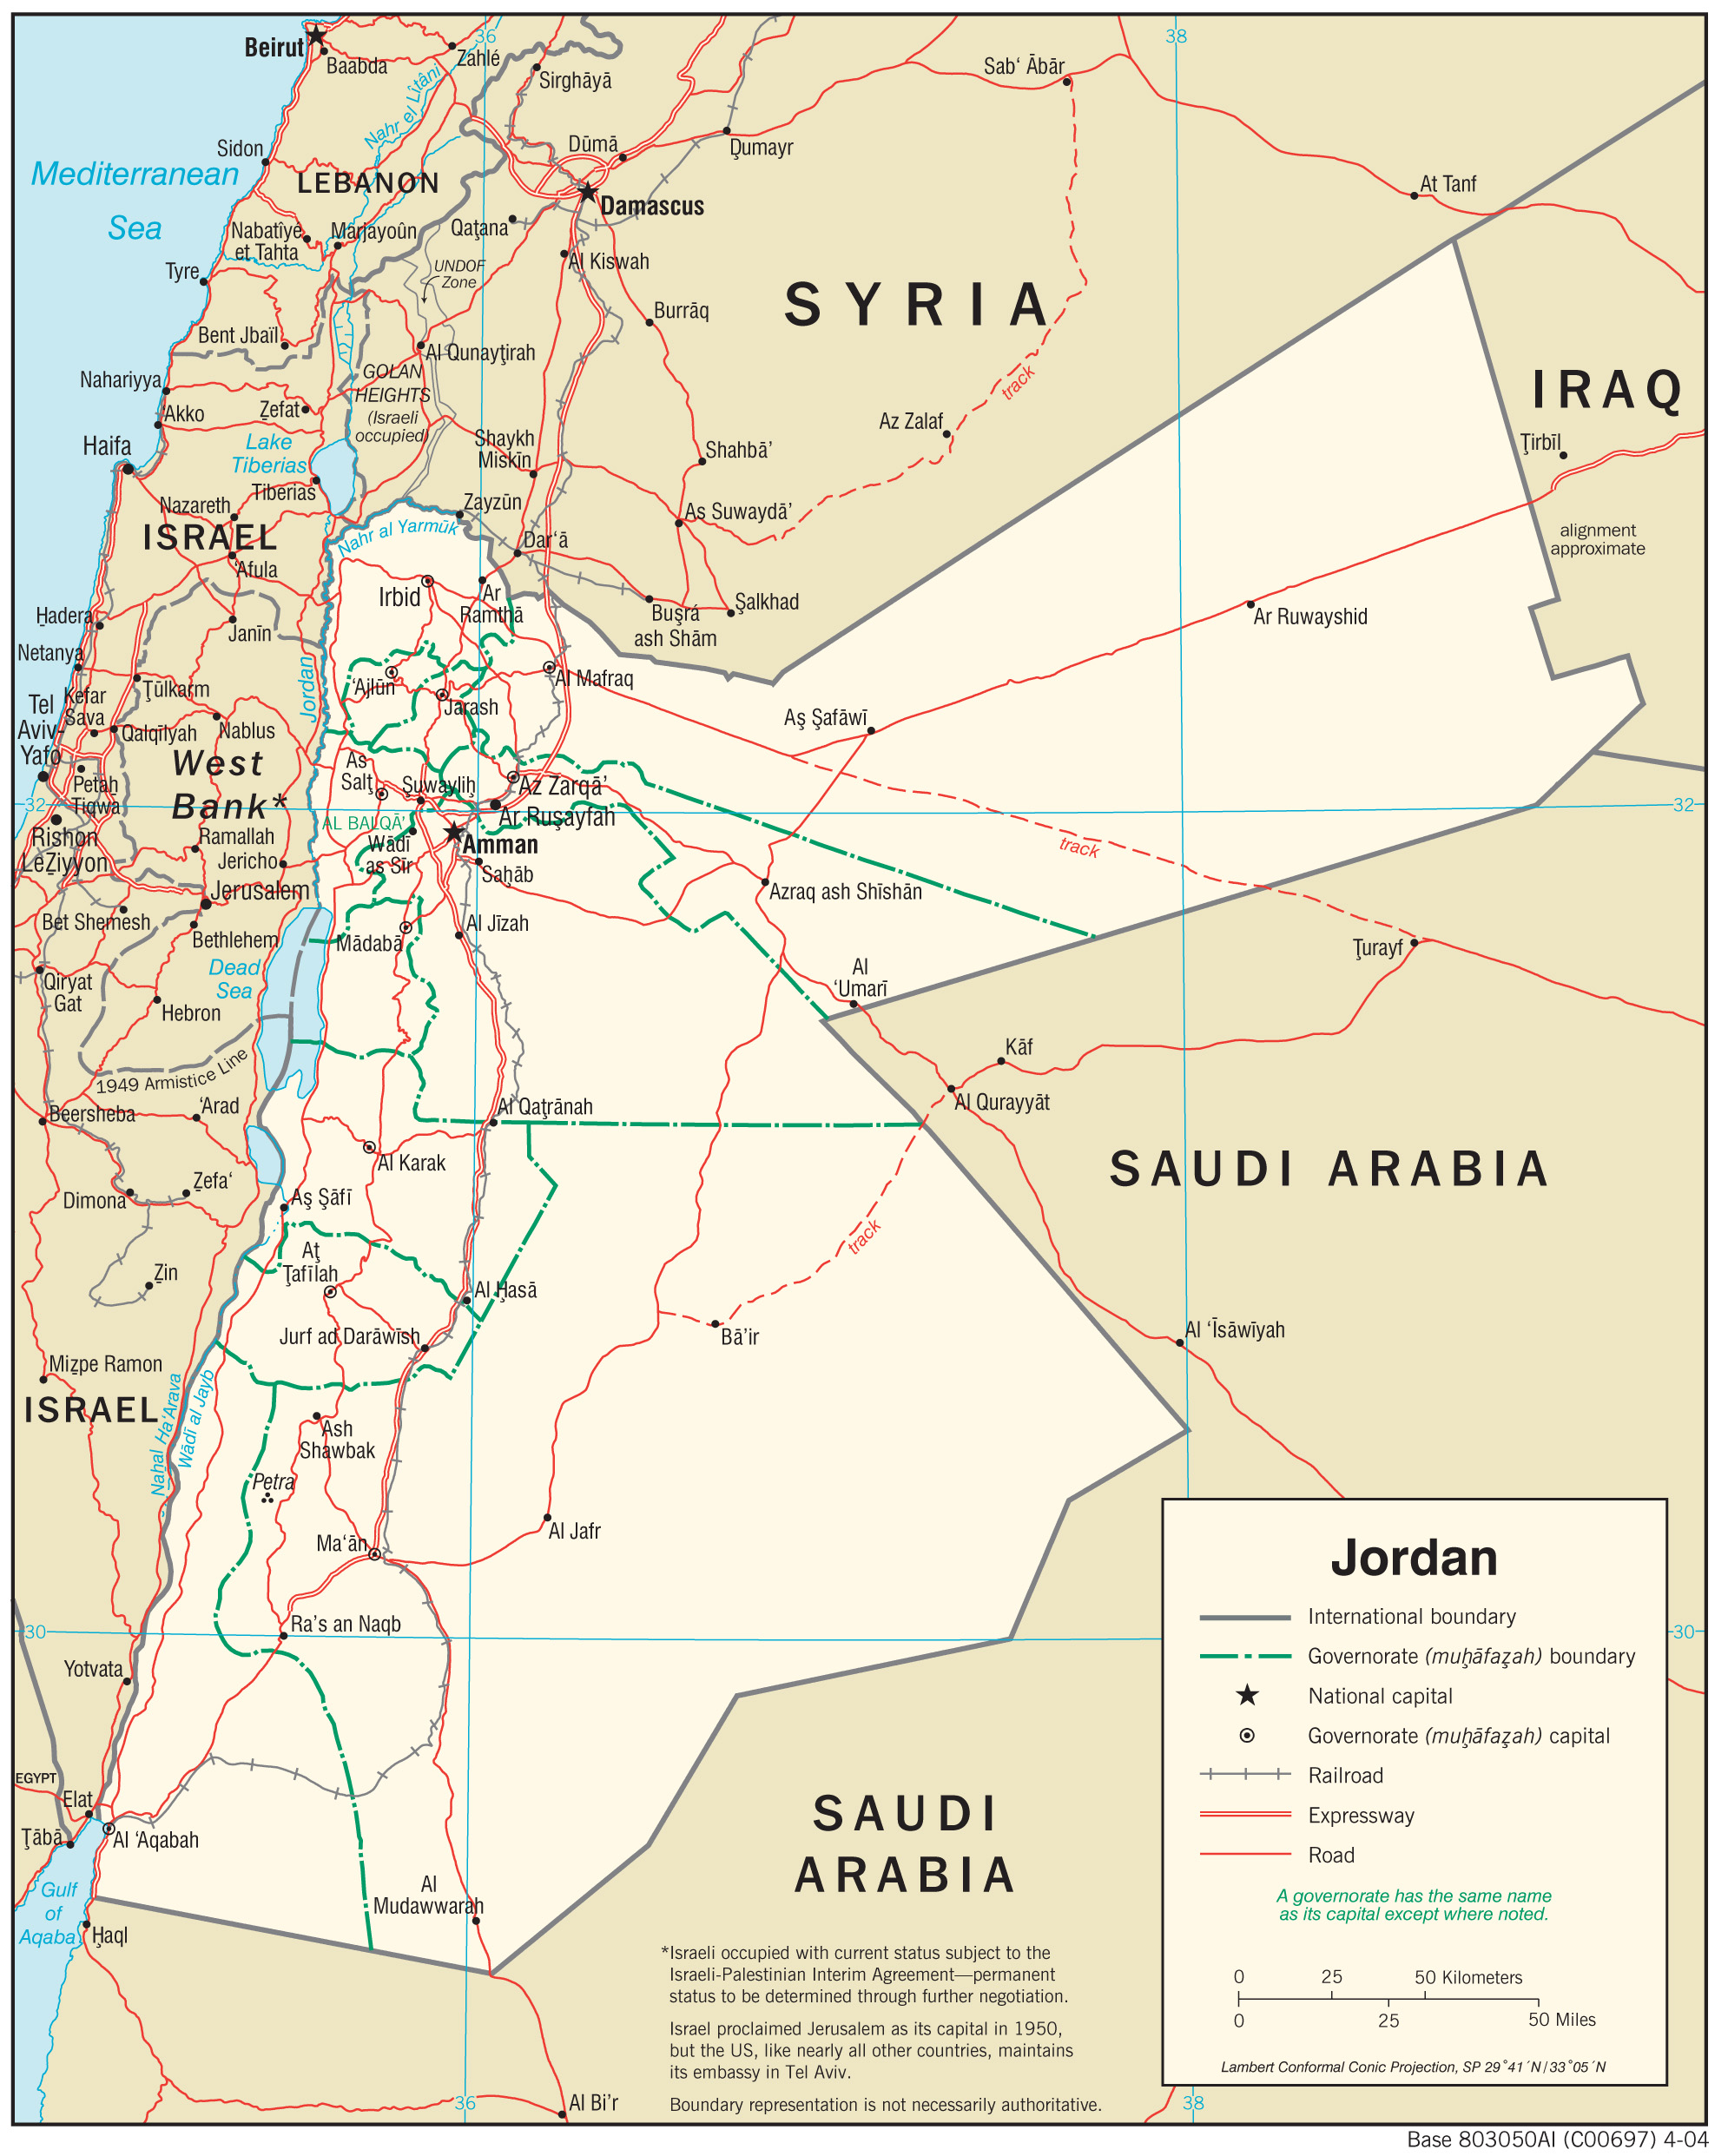 Jordan Maps PerryCastañeda Map Collection UT Library Online - Map of jordan